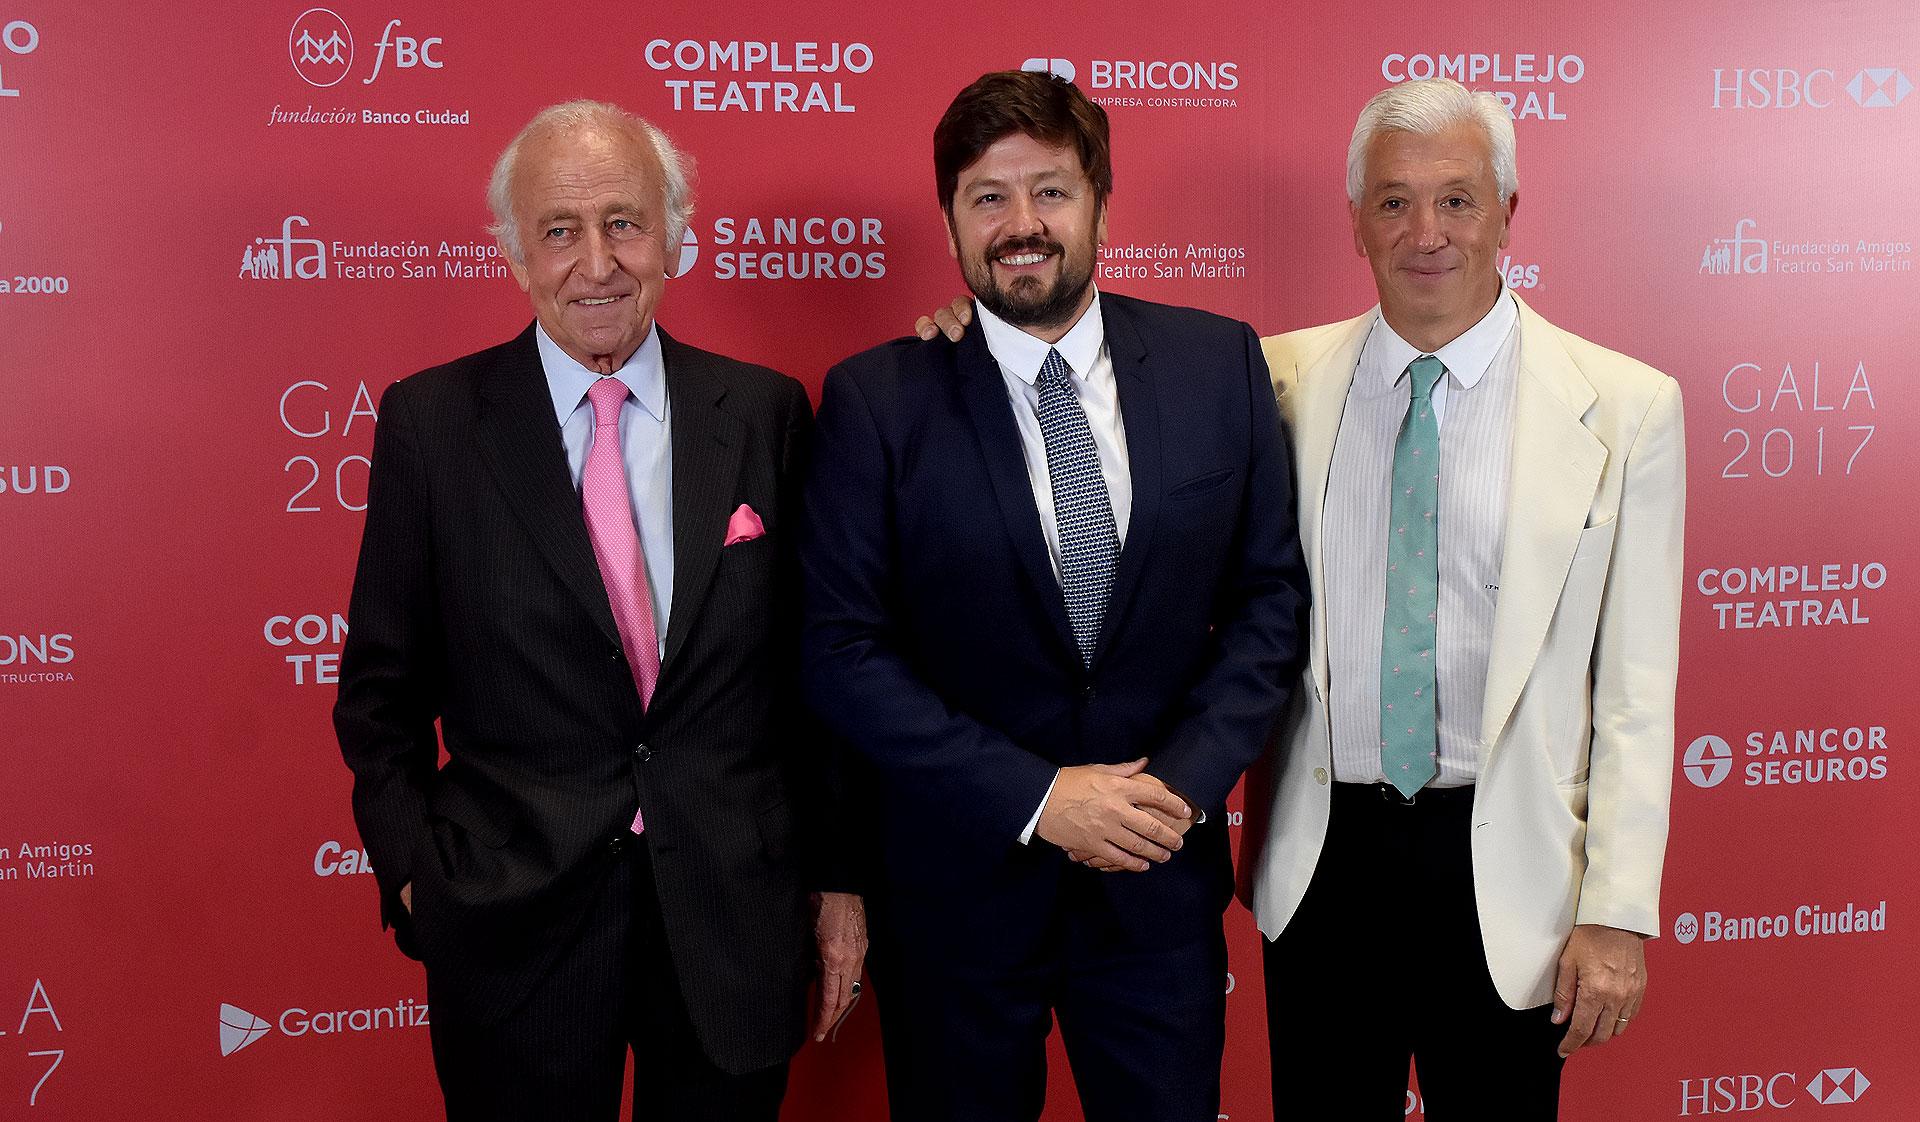 Santiago Soldati, Jorge Lukowski e Ignacio Miguens